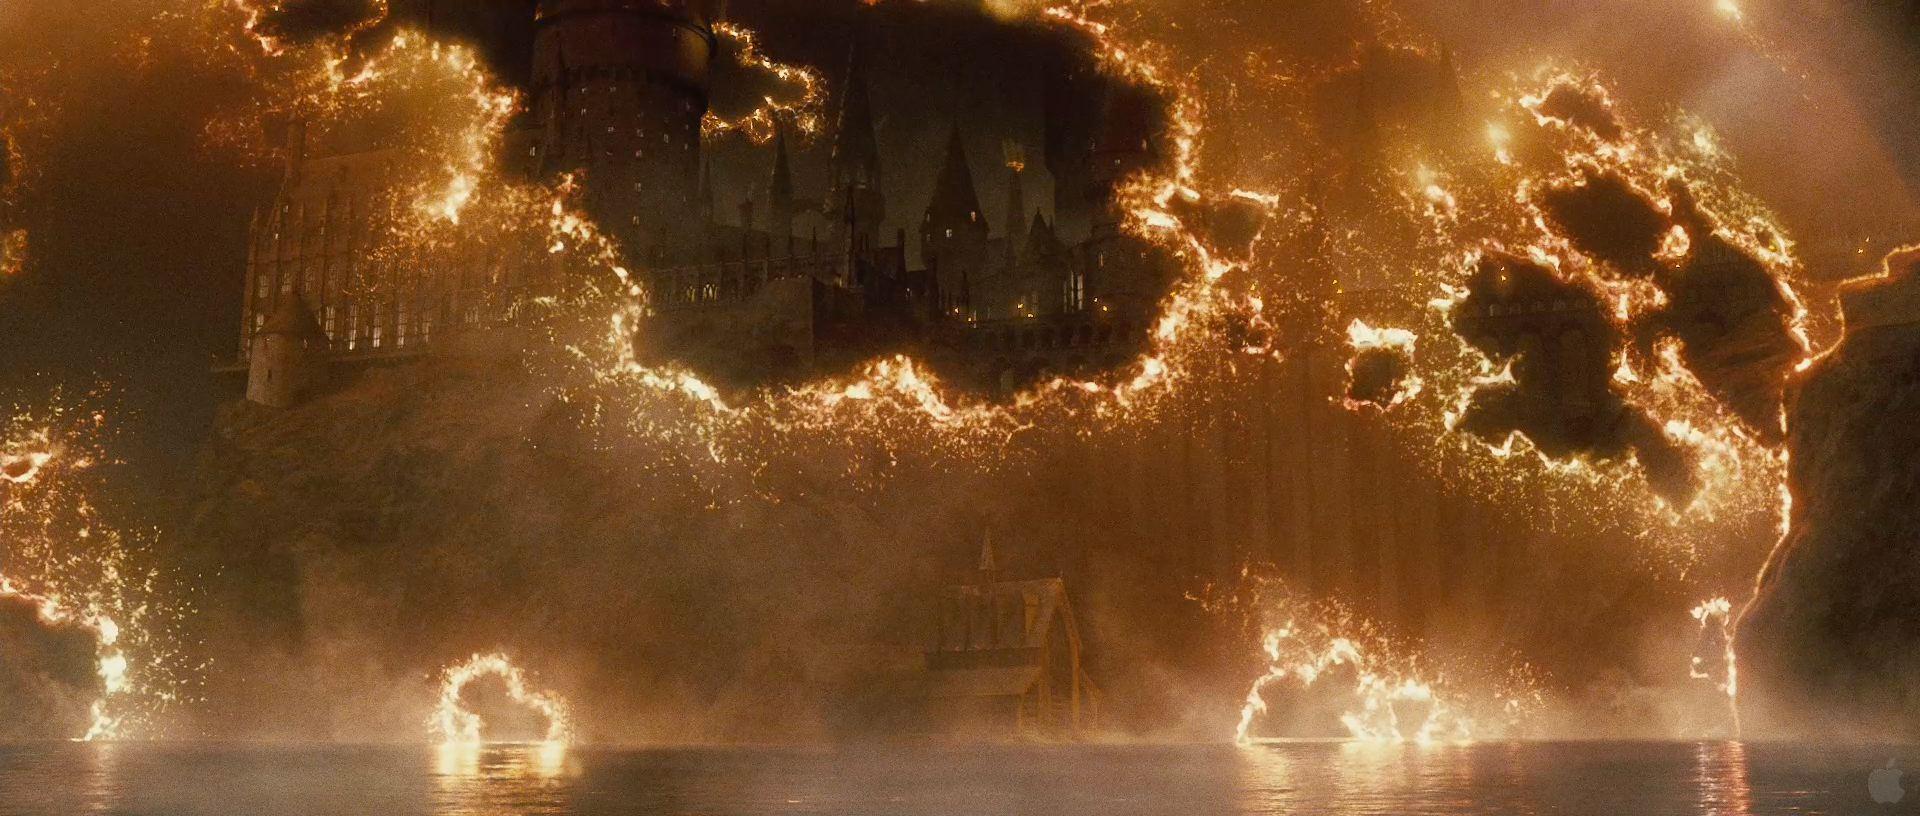 Harry Potter BlogHogwarts HP7 2 Trailer 57